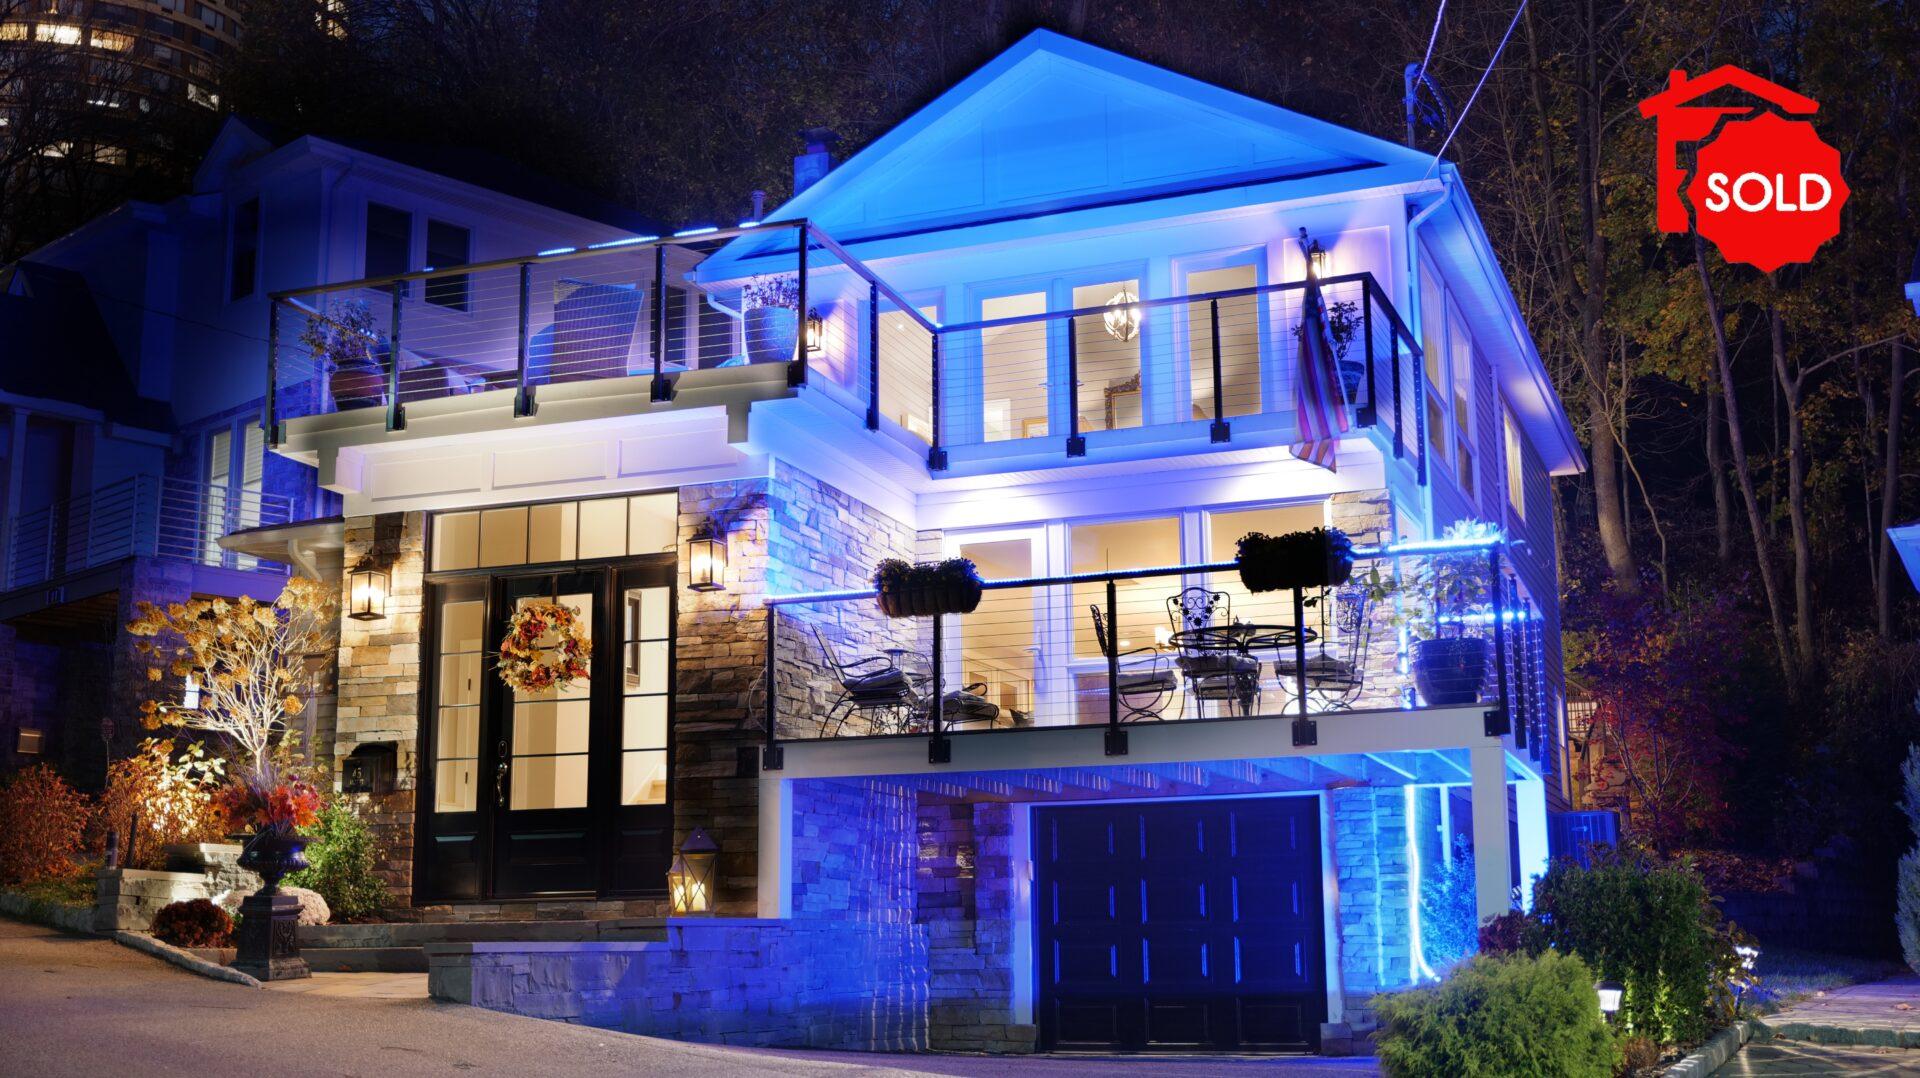 SOLD - 45 Annett Avenue Edgewater, NJ 07020 <br><br> $1,199,000 - Beds: 3 - Bath: 3